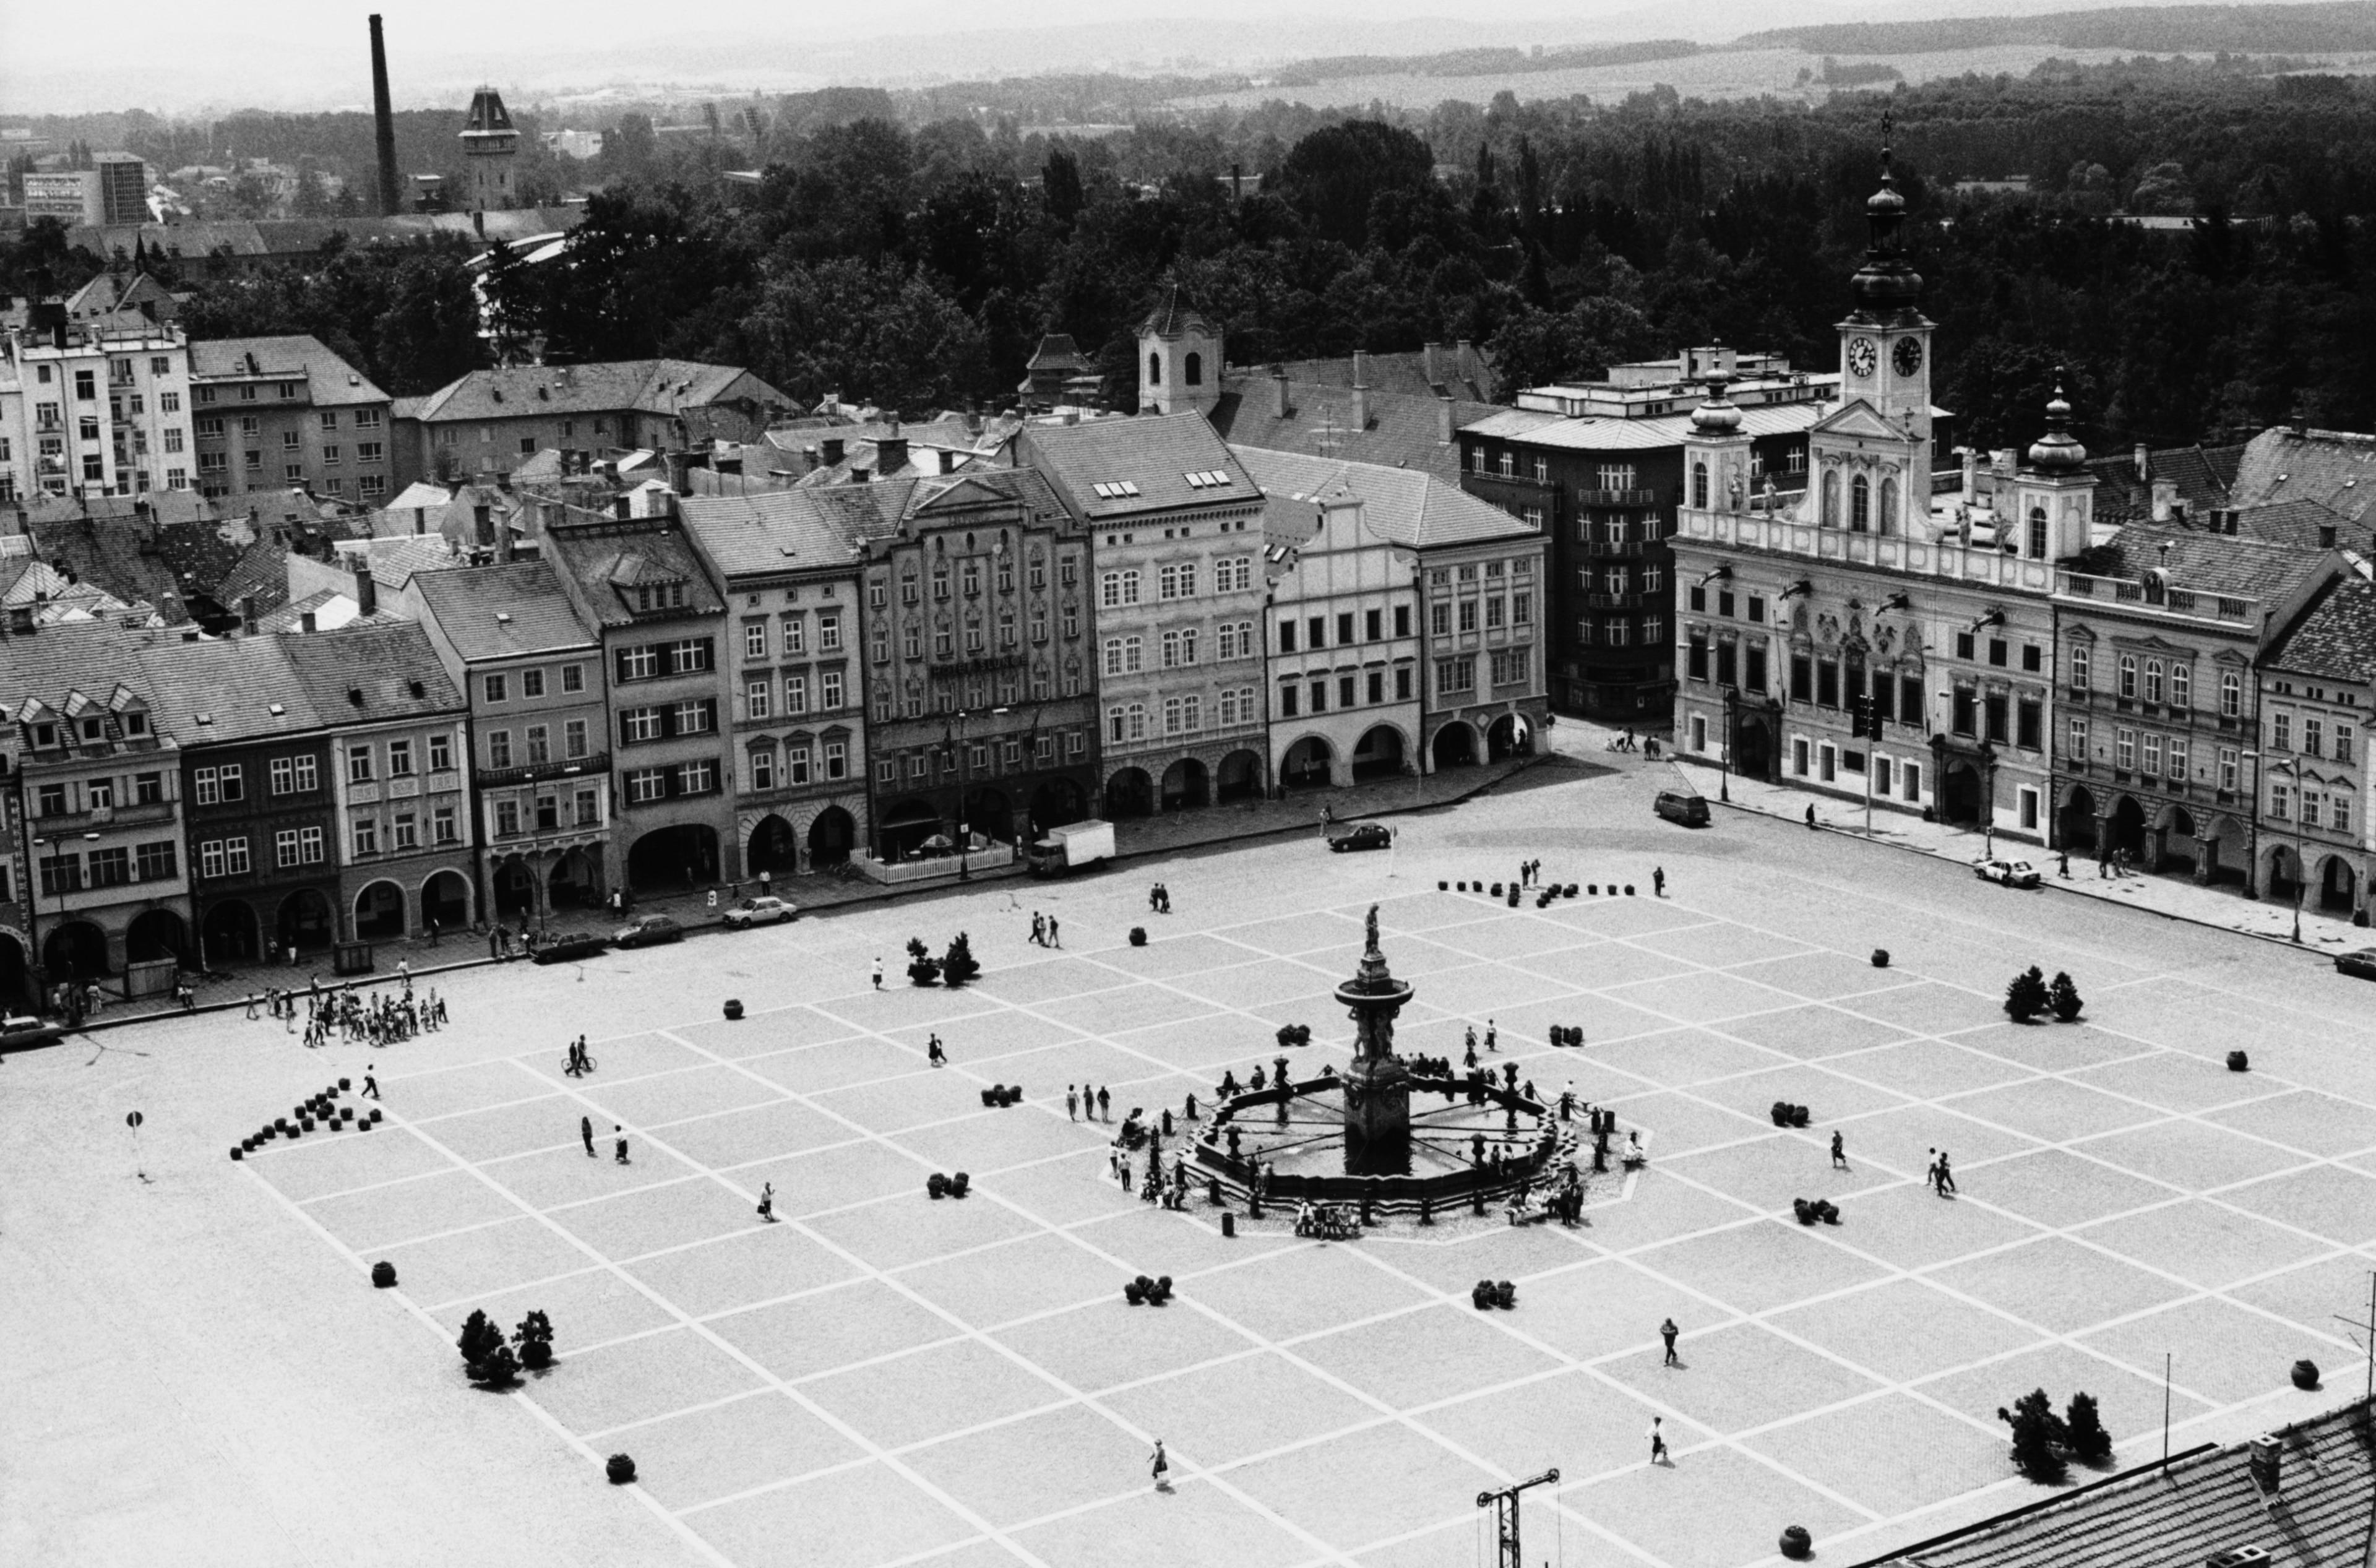 Piarist Square, Ceske Budejovice, South Bohemia Region, Czech Republic